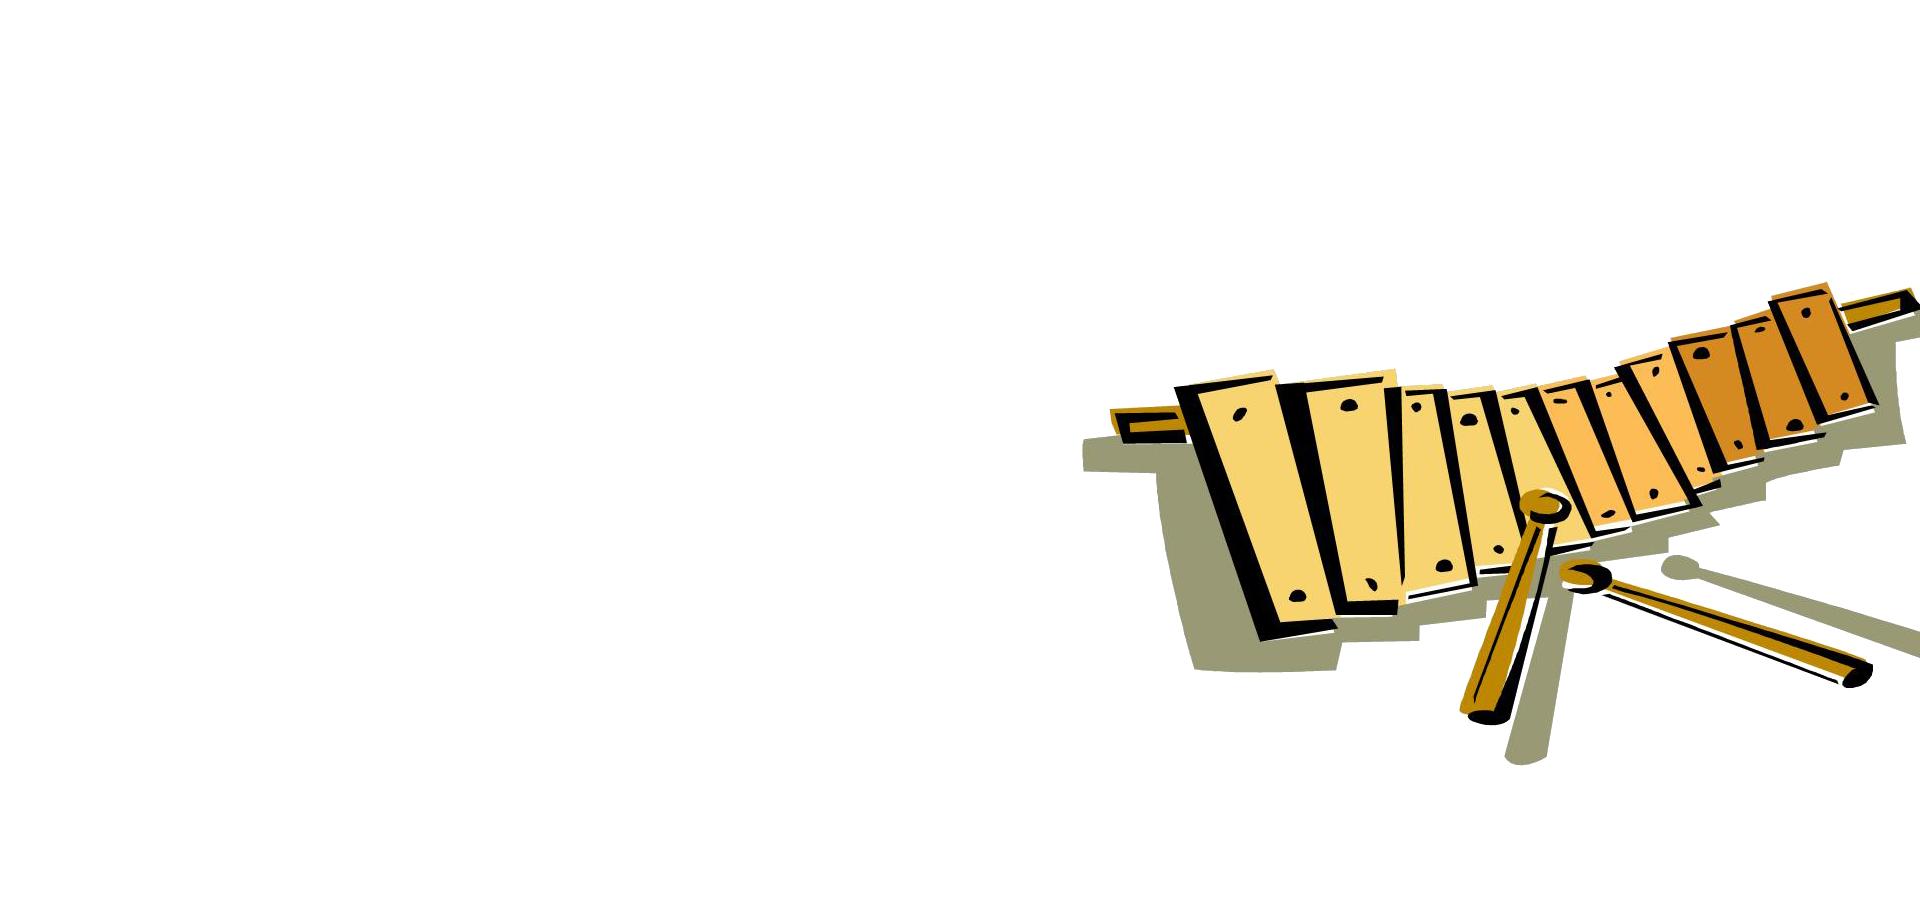 Xylophone clipart orff. Clip art vector design